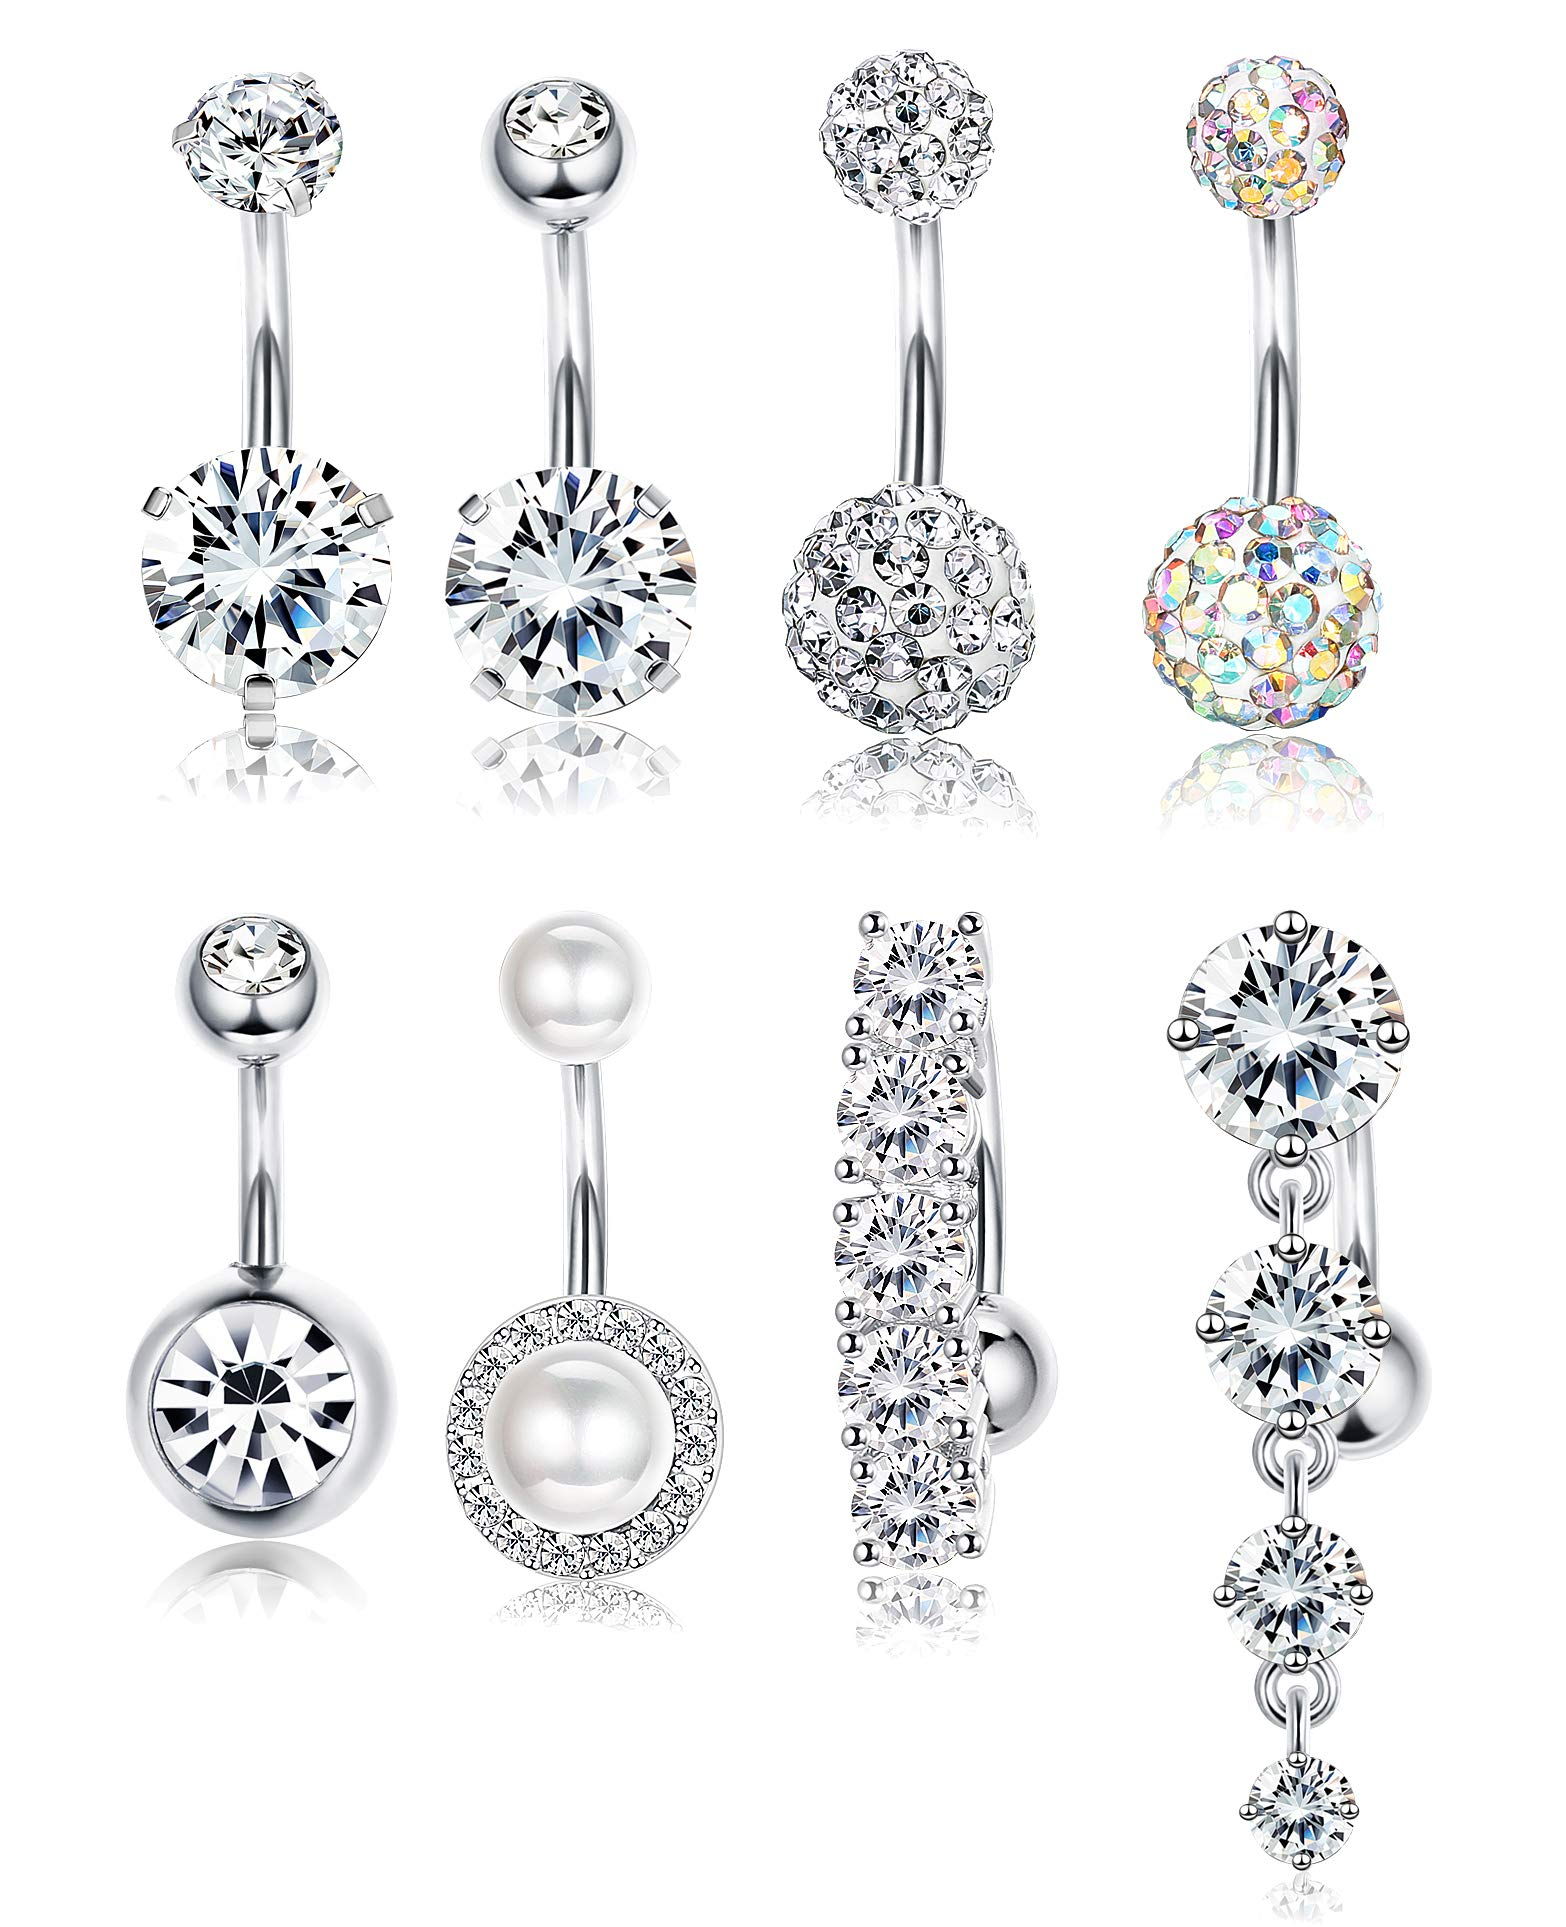 Udalyn 8pcs Belly Button Rings for Women Girls Dangle Ball Navel Rings Body Jewelry Piercing 14G